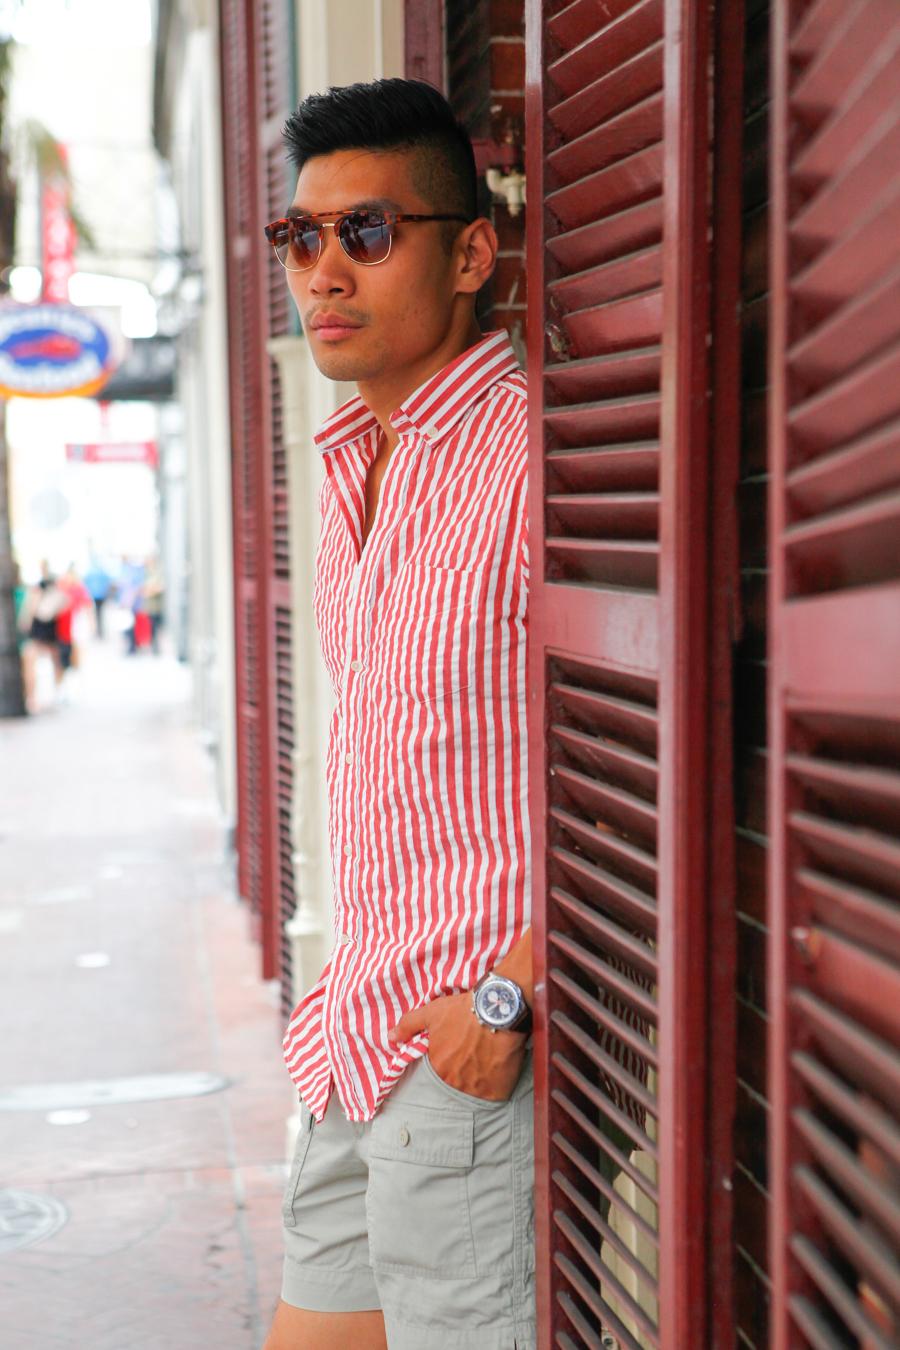 Levitate Style Gordon Rush City - New Orleans   Gordon Rush Liverpool Chukka Sneaker, Haspel Seersucker Shirt, menswear, Leo Chan, Alicia Mara